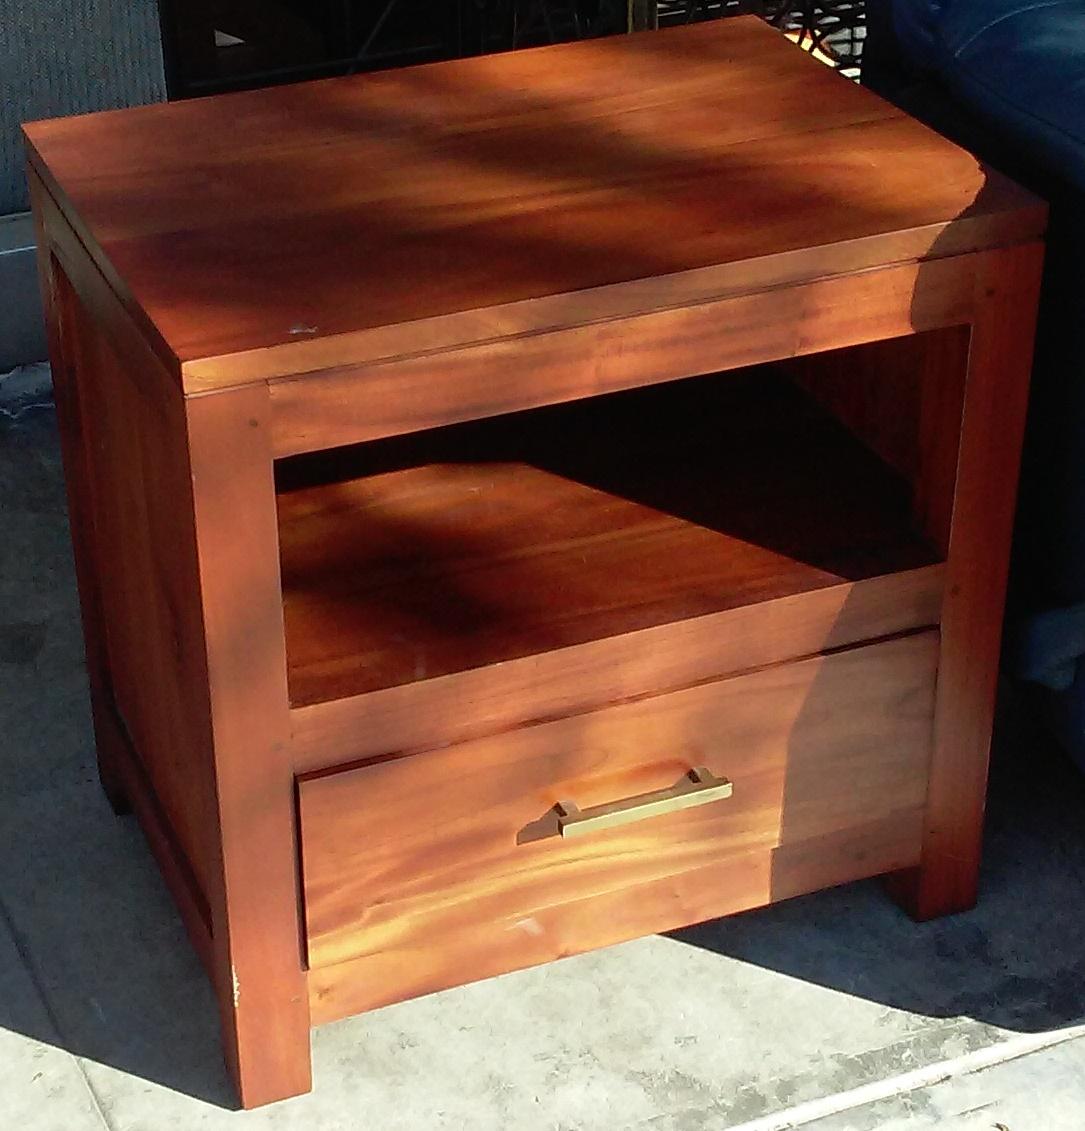 Uhuru Furniture Collectibles Sold Solid Asian Teak Nightstand 35